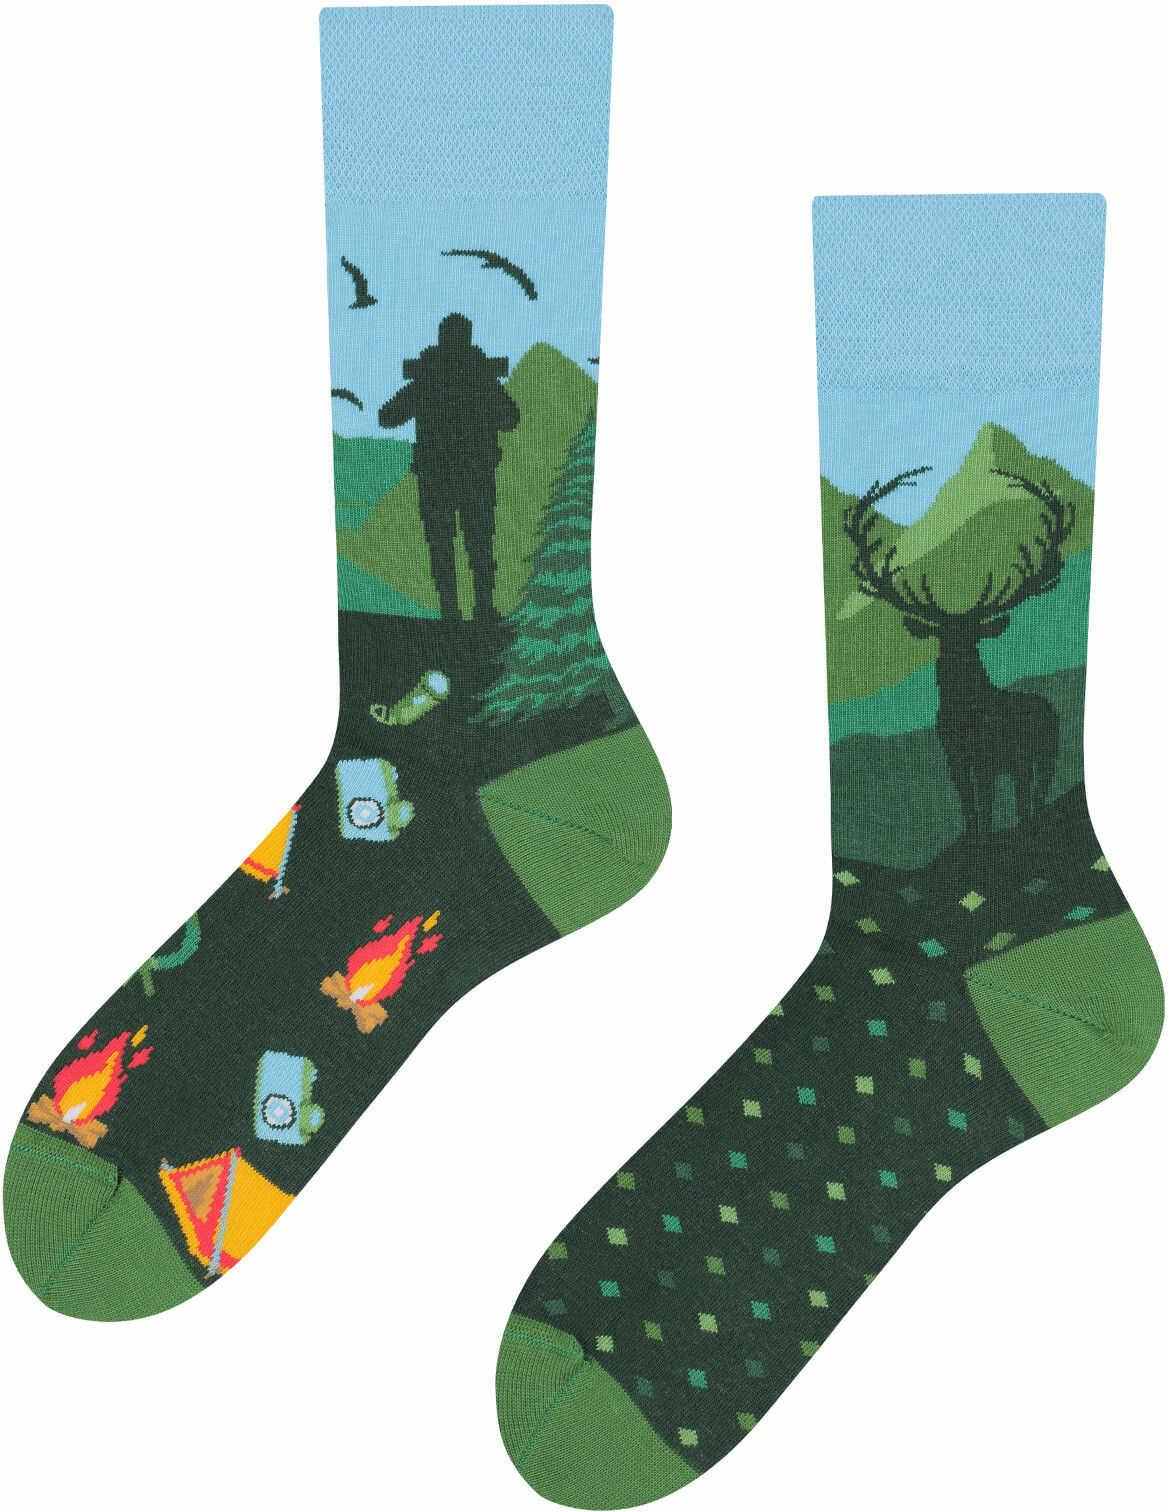 Mountain Trail, Todo Socks, Góry, Trekking, Szlak, Kolorowe Skarpetki